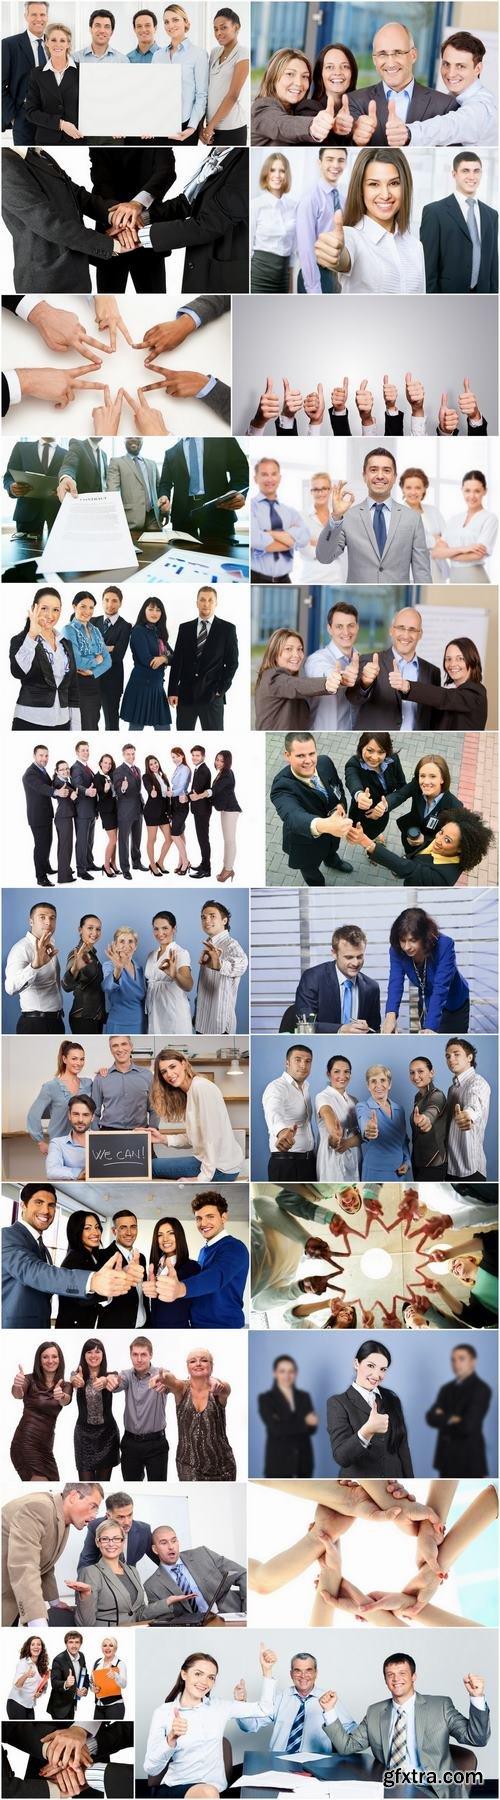 Teamwork businessman business woman friendship 25 HQ Jpeg